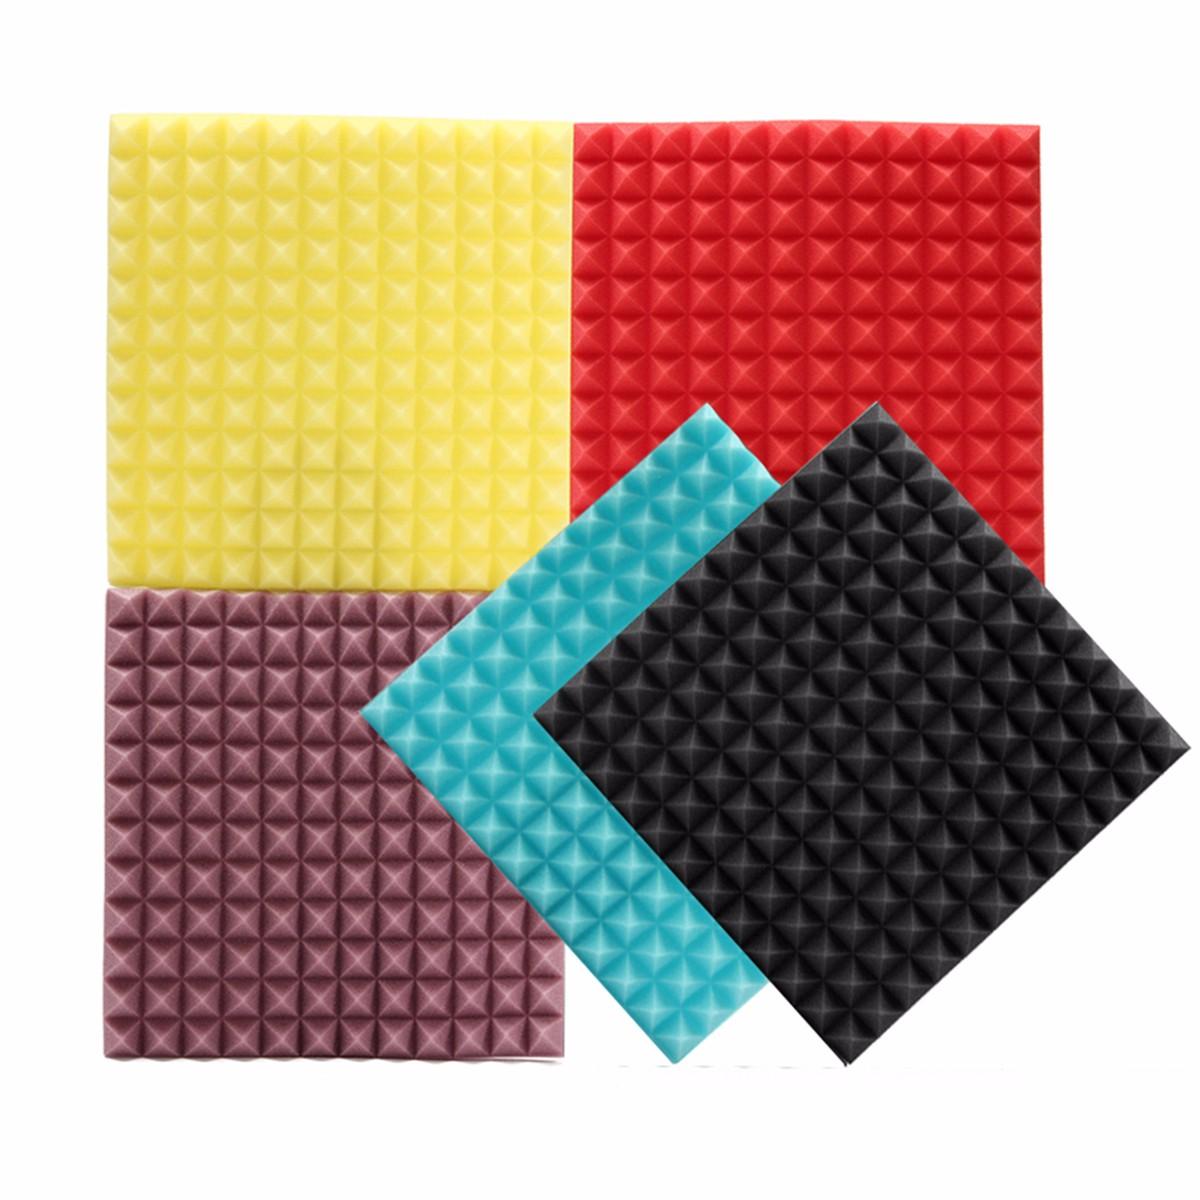 "1Pcs 12""x12""x1.2"" Acoustic Foam Panels Soundproofing Wedge Wall Tiles Studio Acoustic Foam Sponge Insulation Sound For KTV Studio"